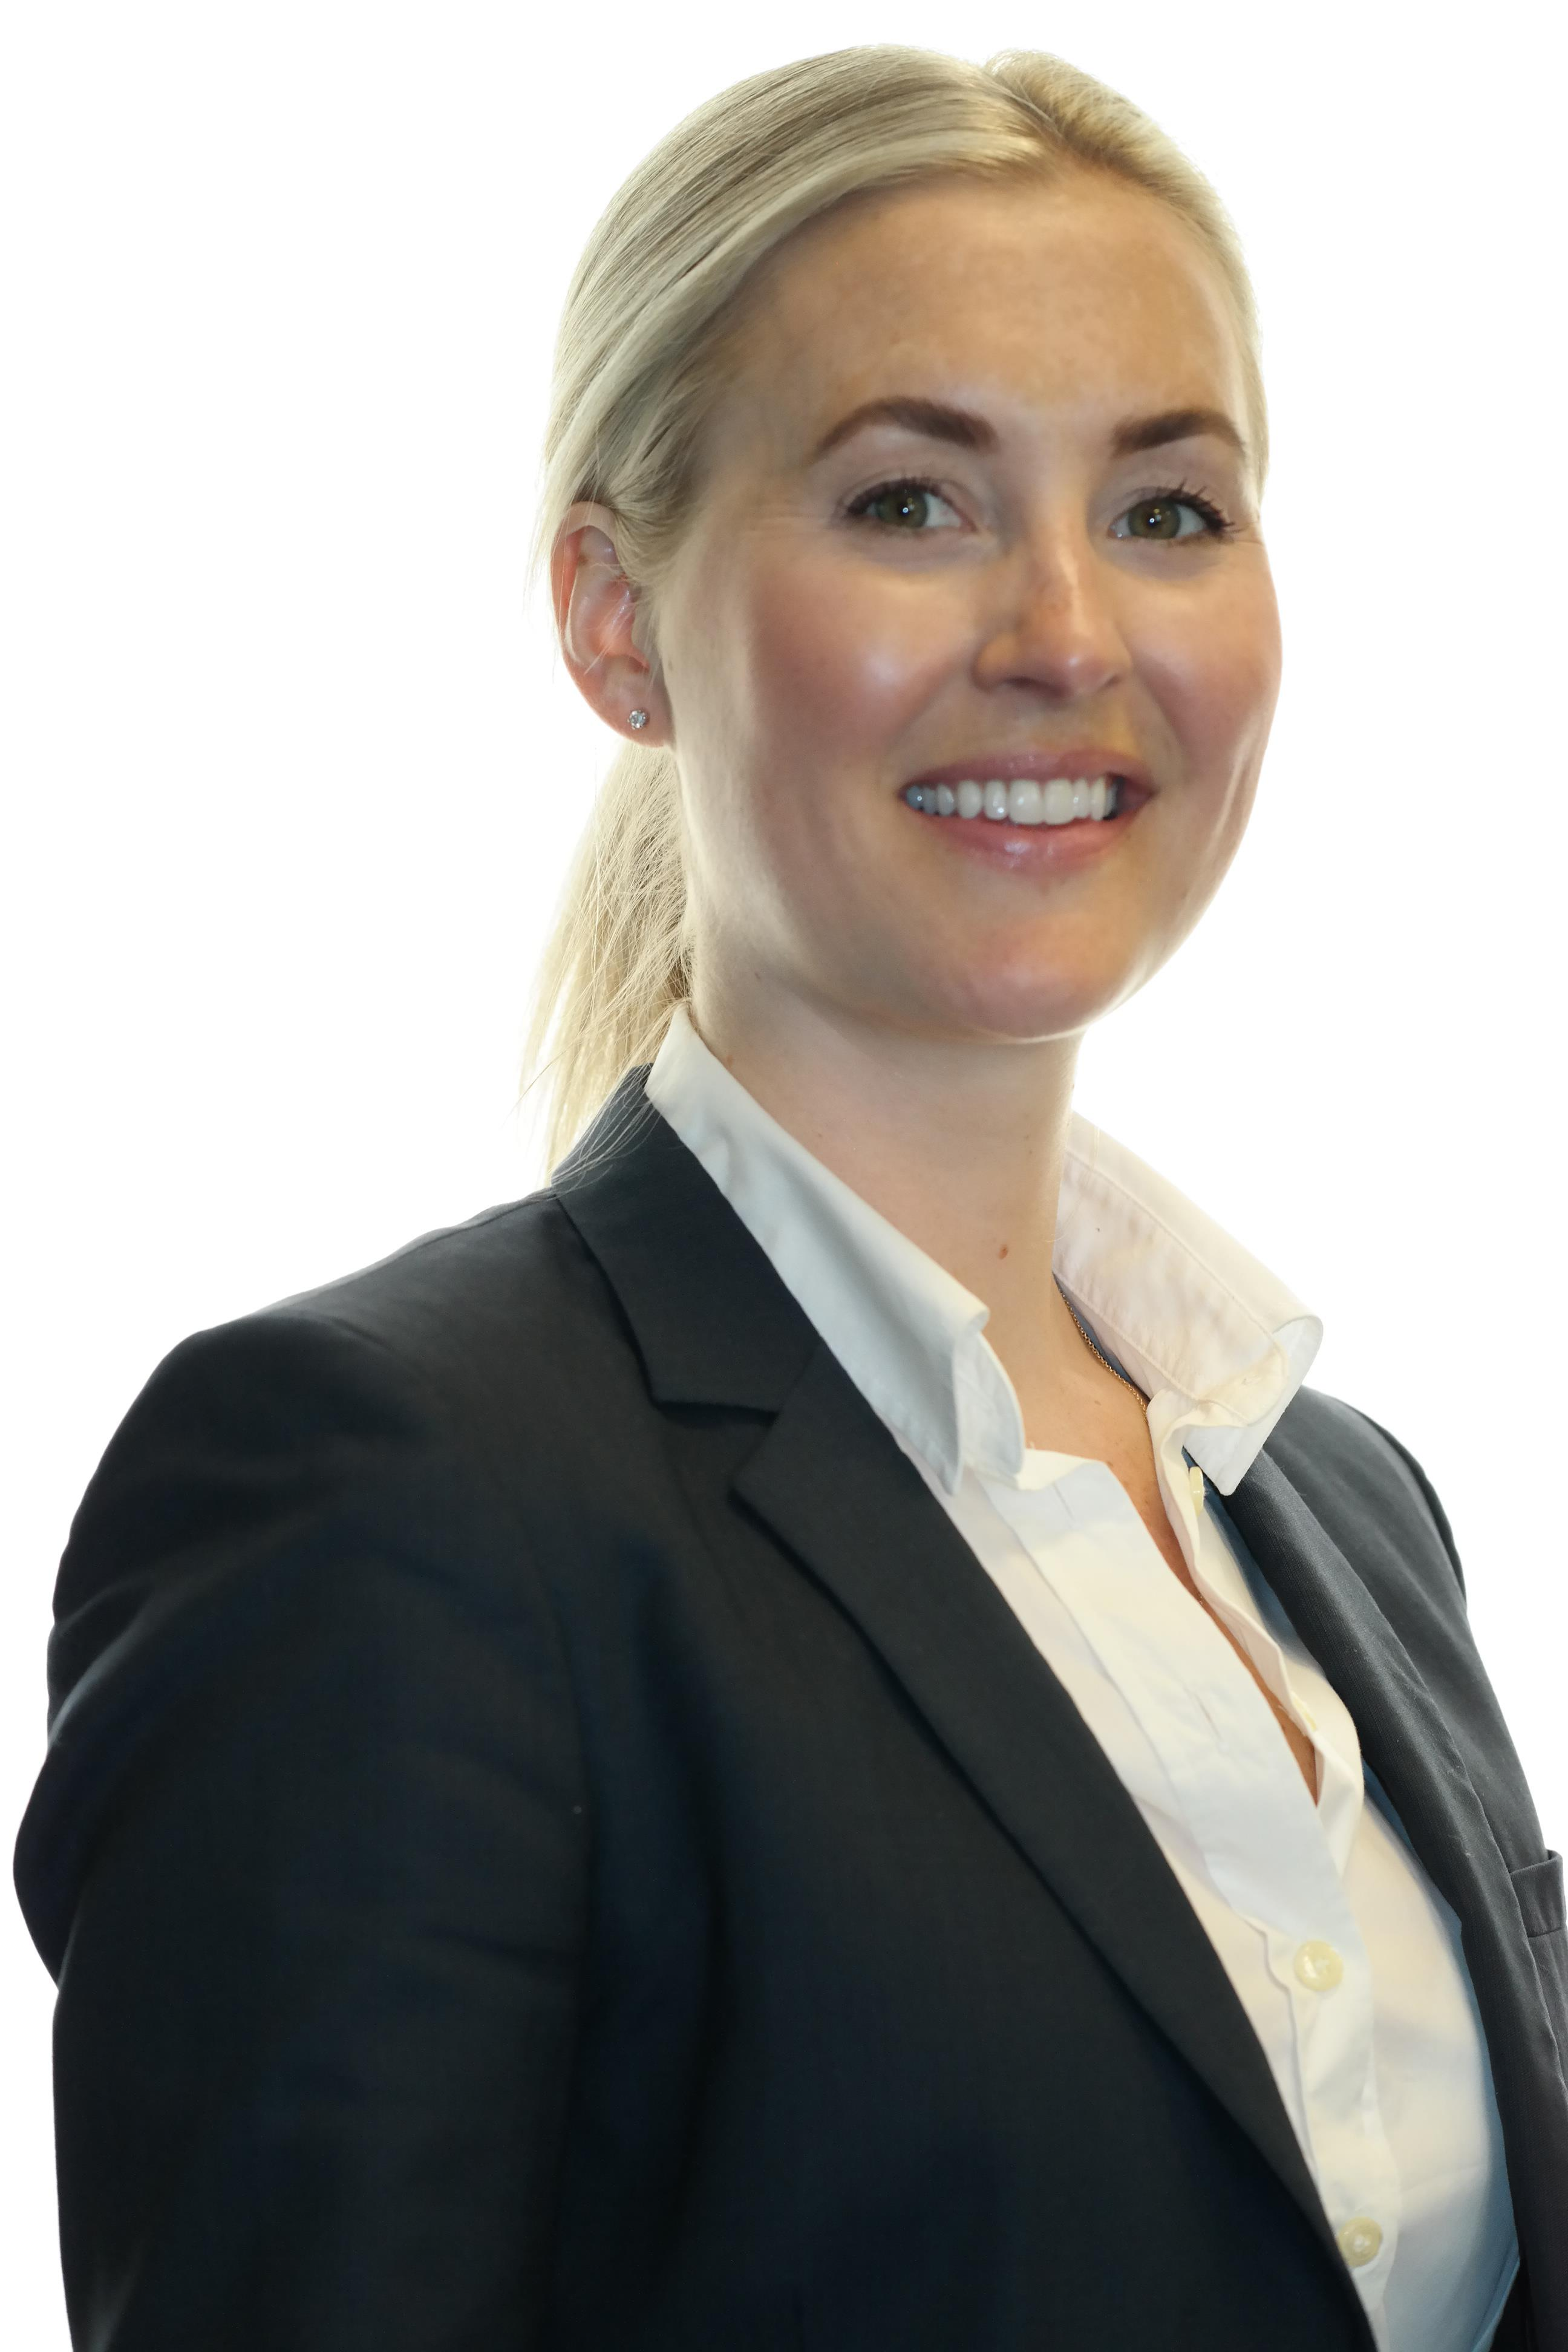 Angelica Hoff Eide